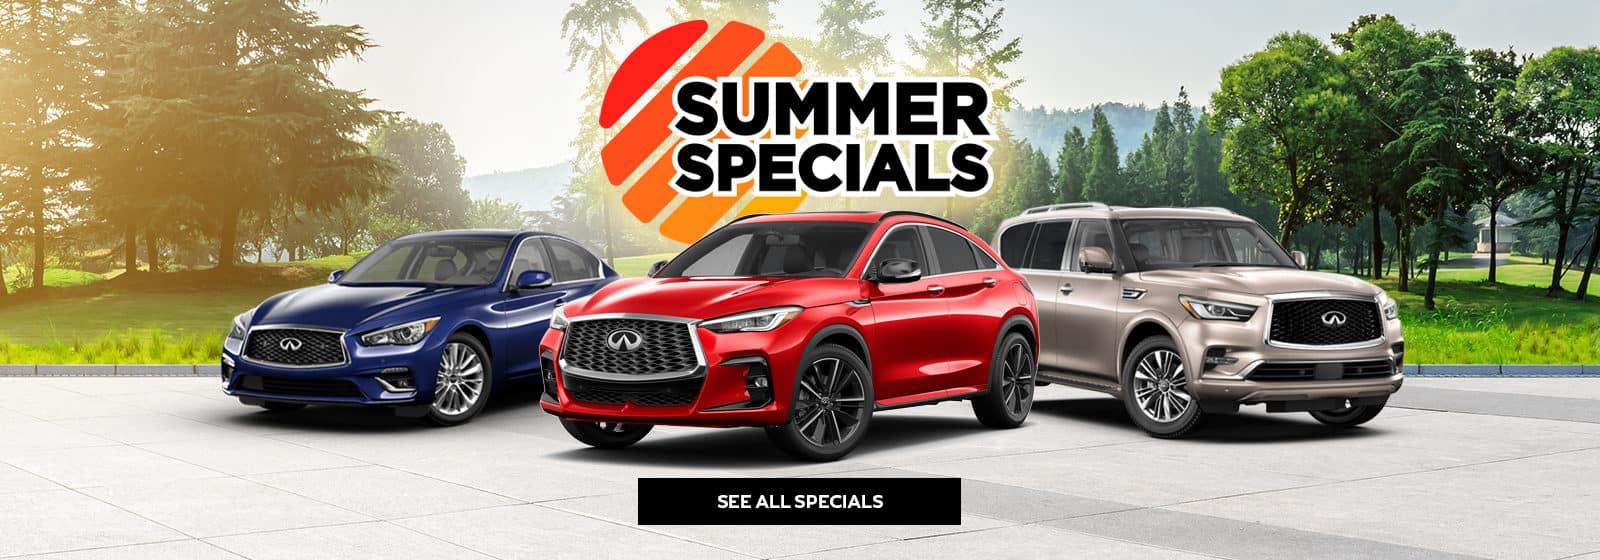 INFINITI summer specials with three INFINITI models shown